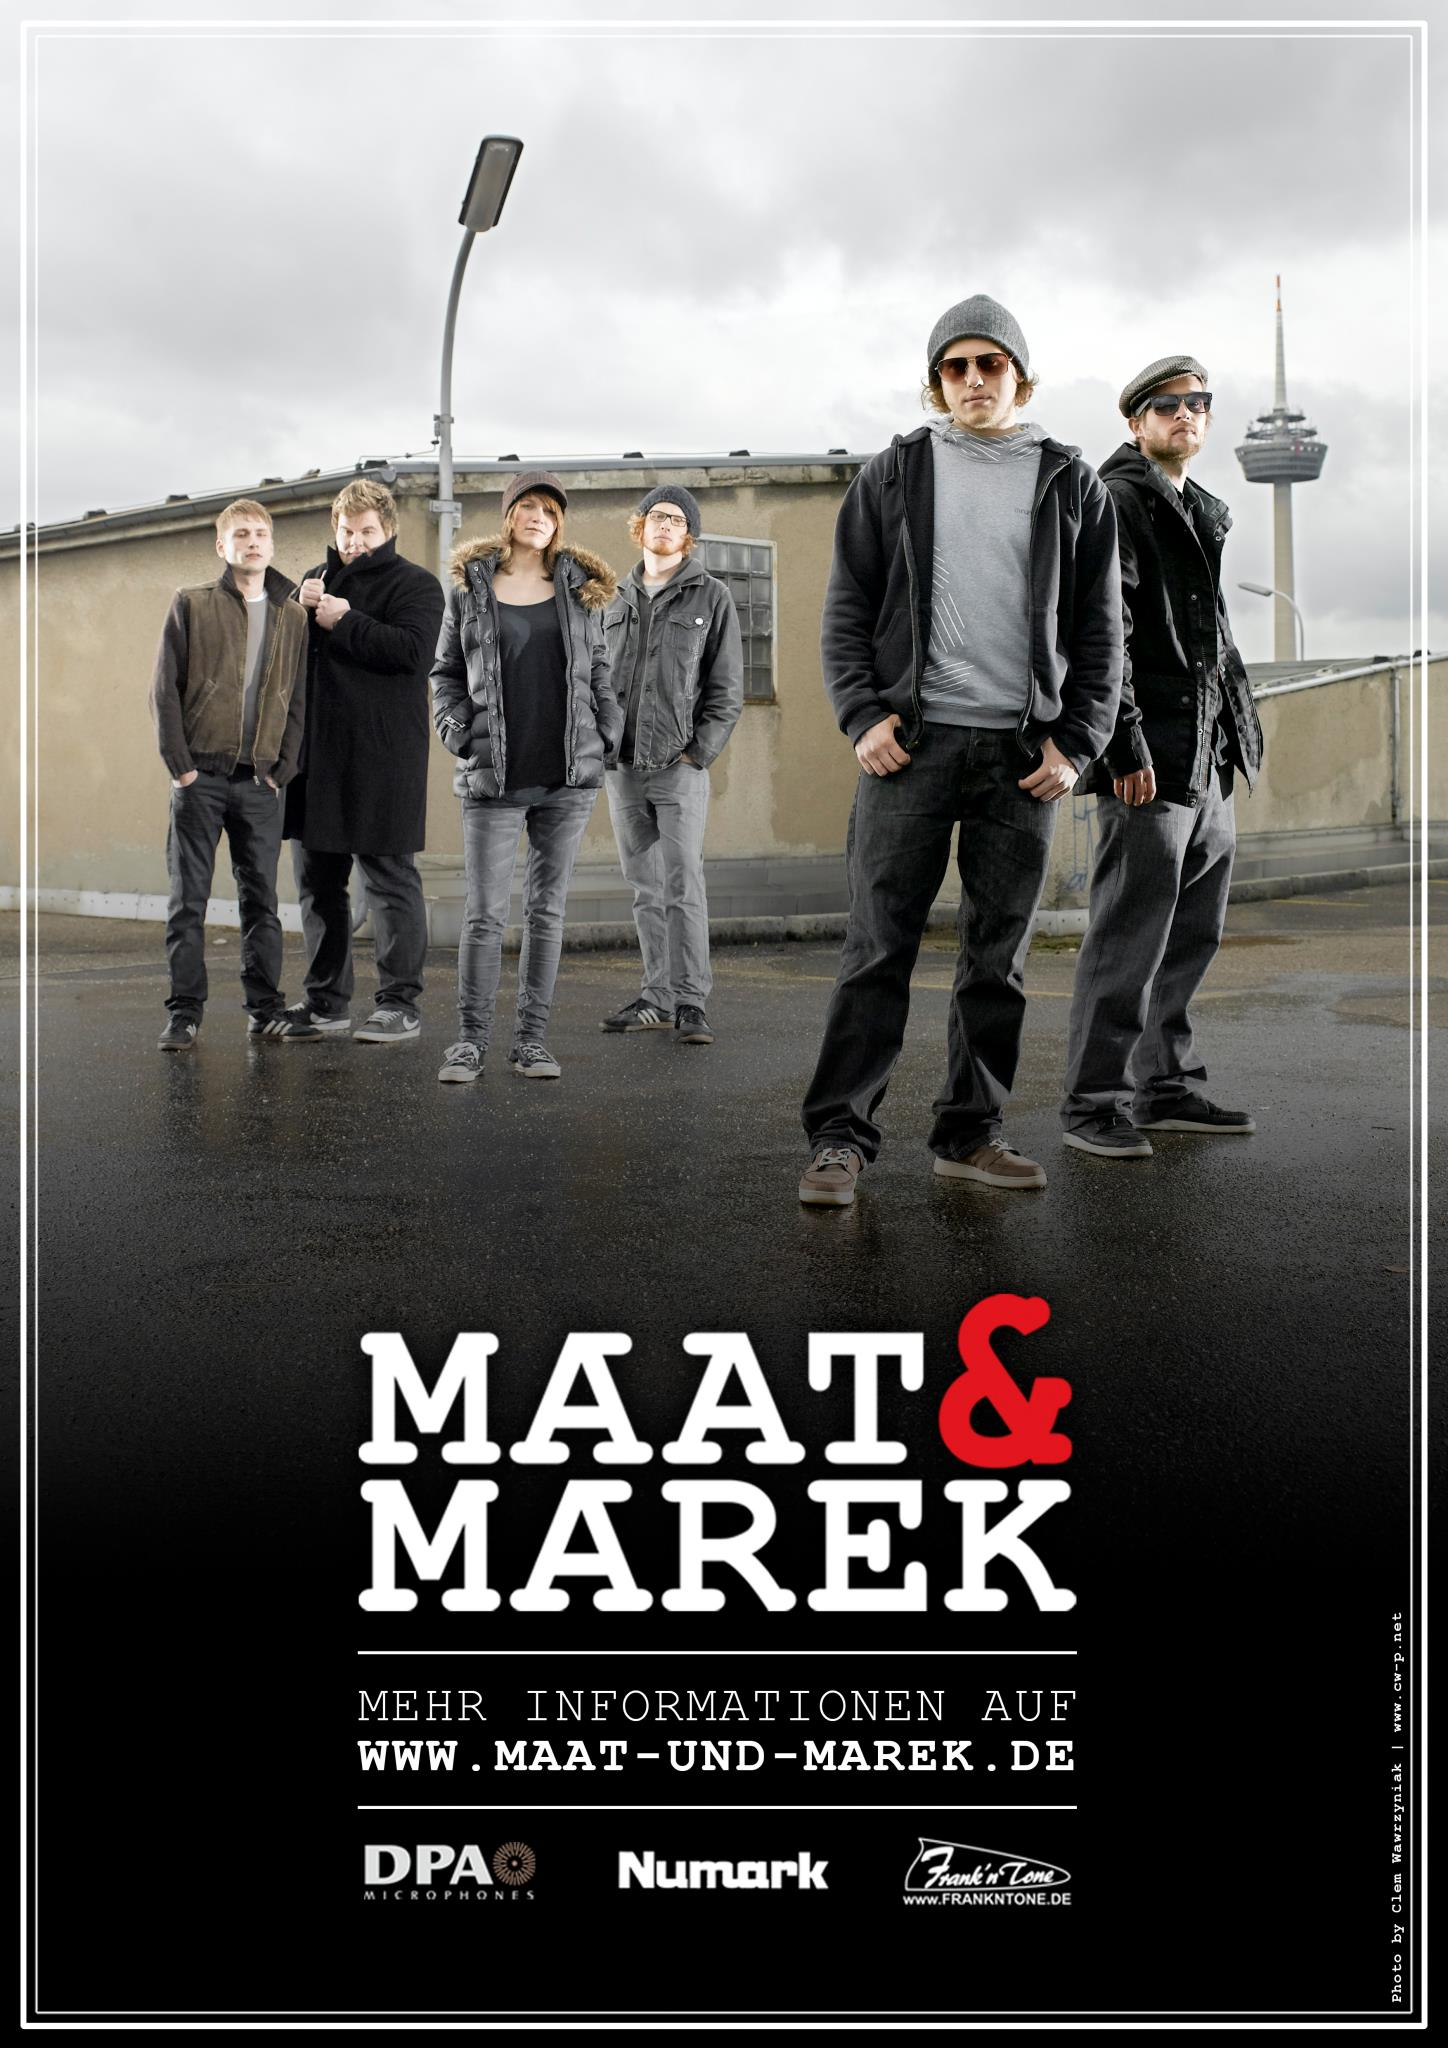 Maat & Marek